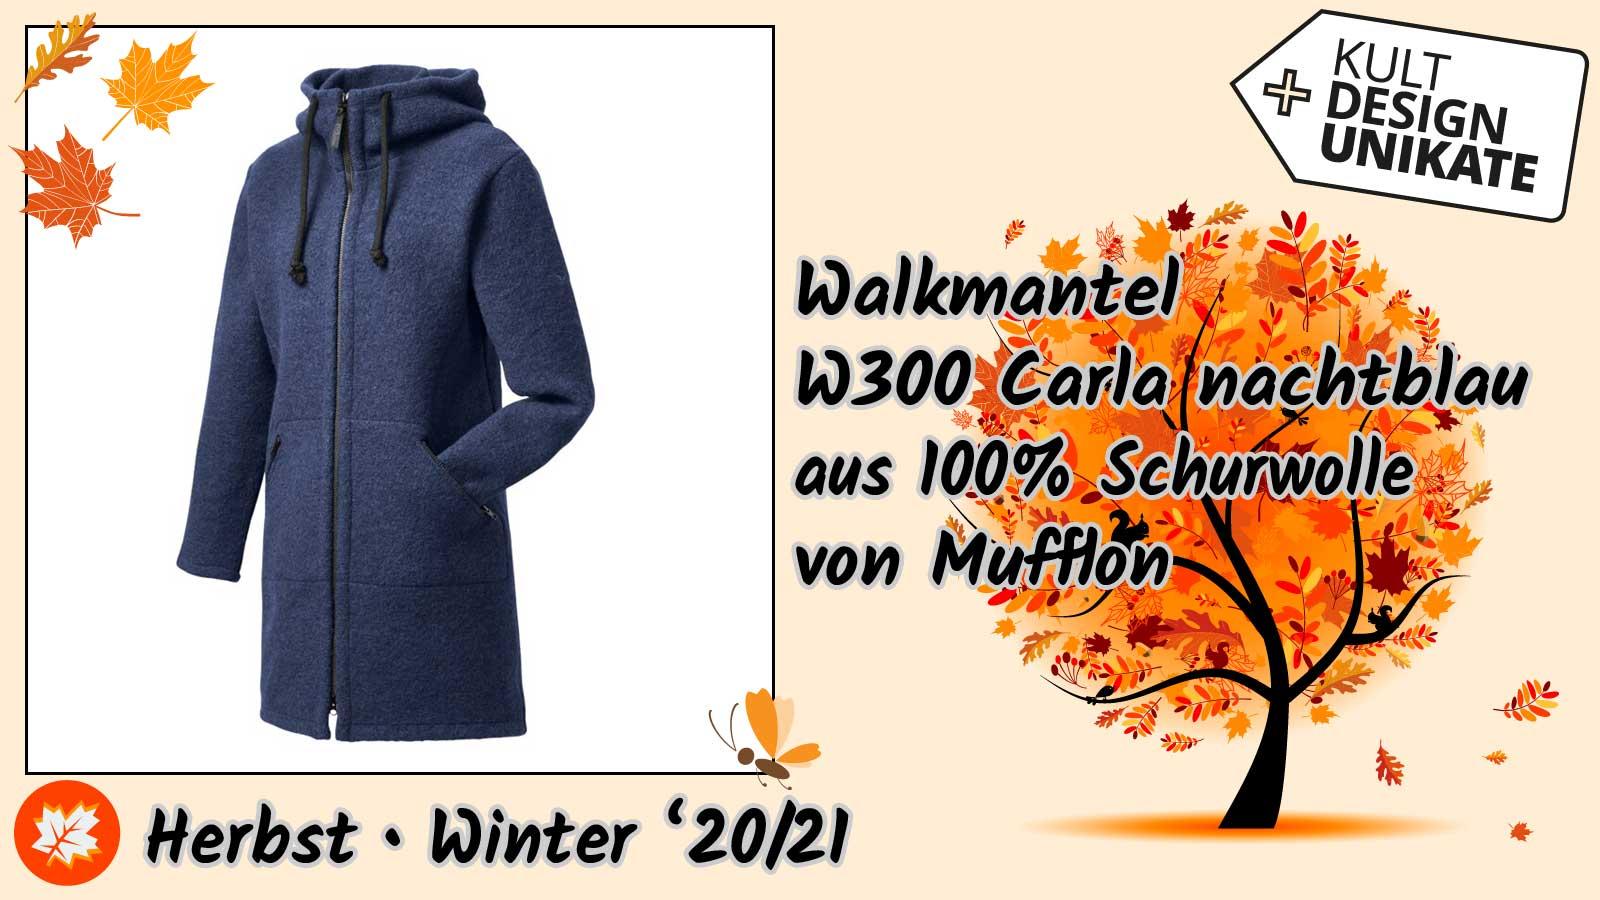 Mufflon-Walkmantel-W300-Carla-nachtblau